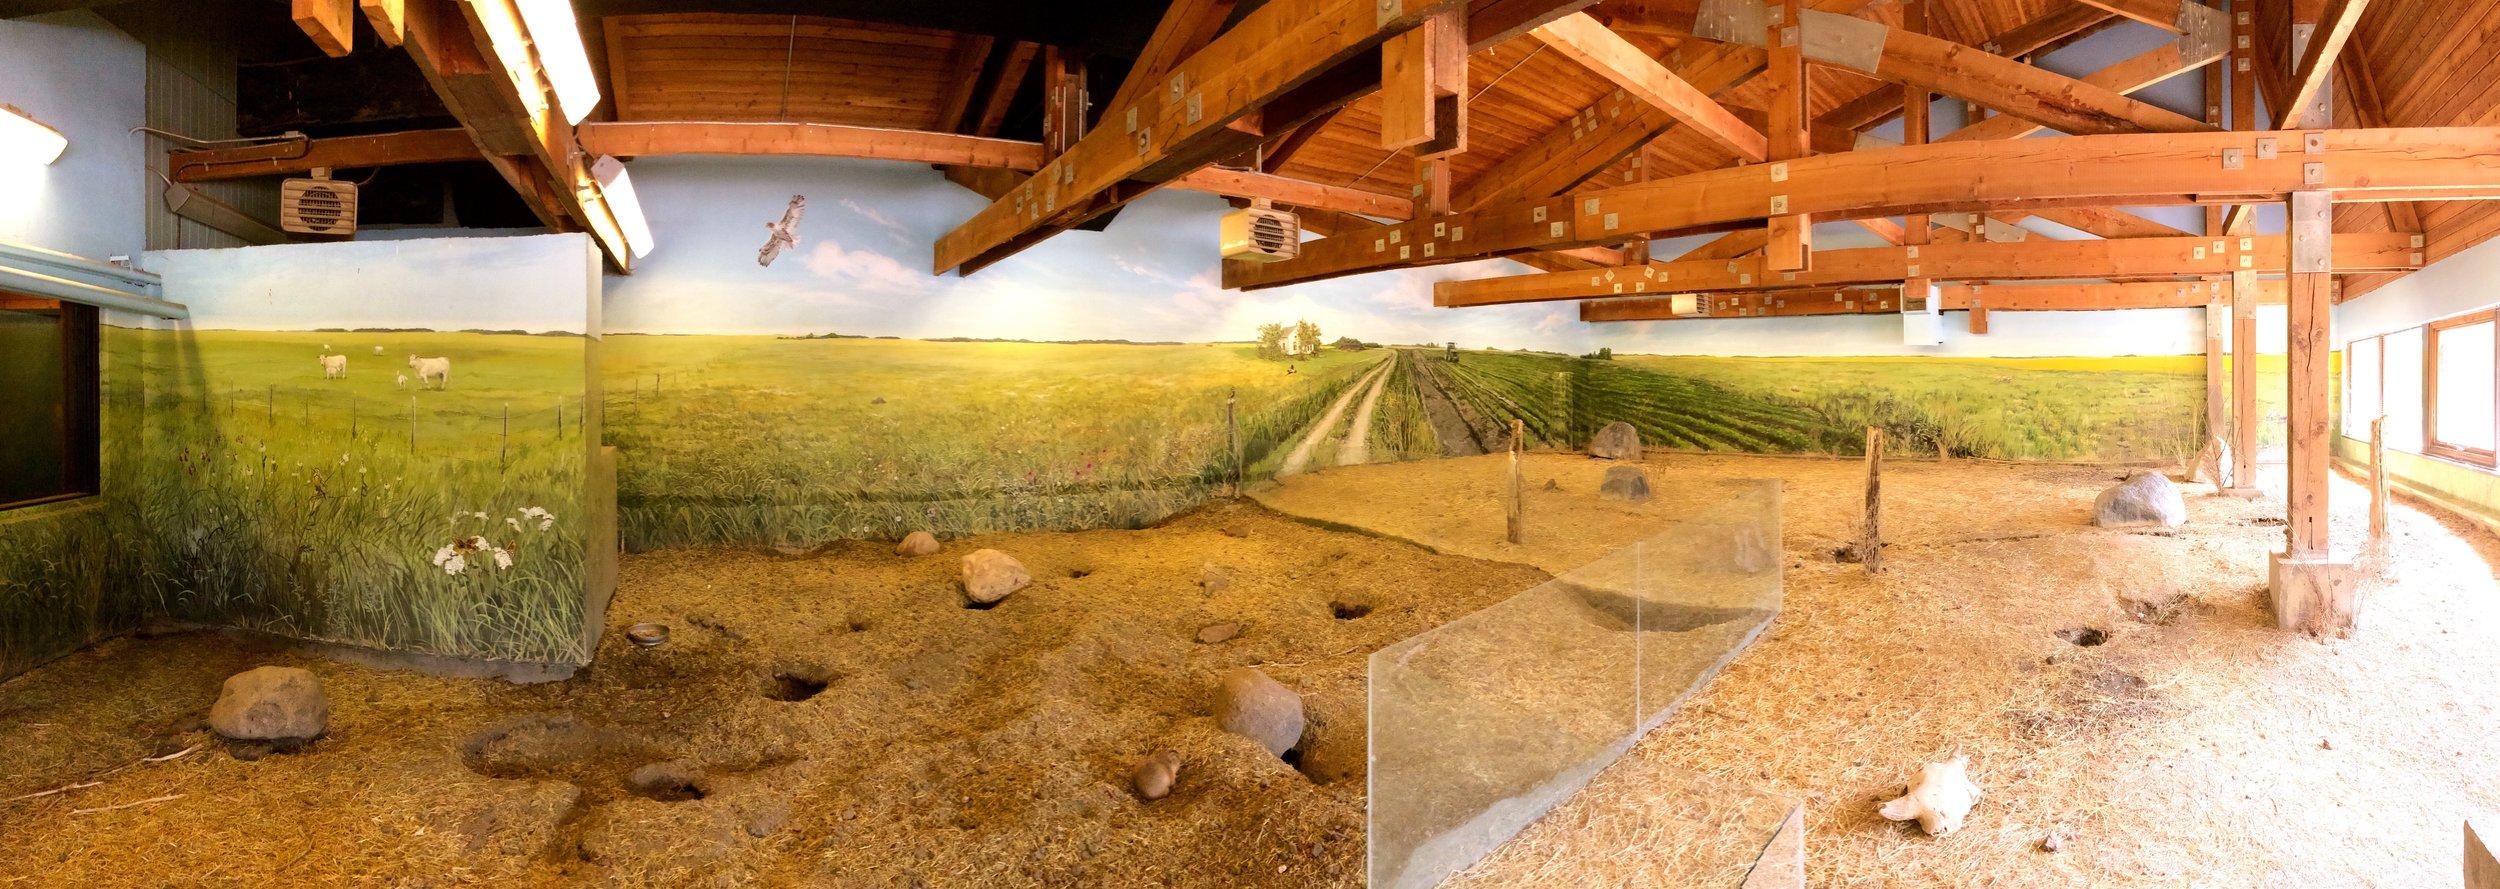 Prairie Dog & Burrowing Owl habitat